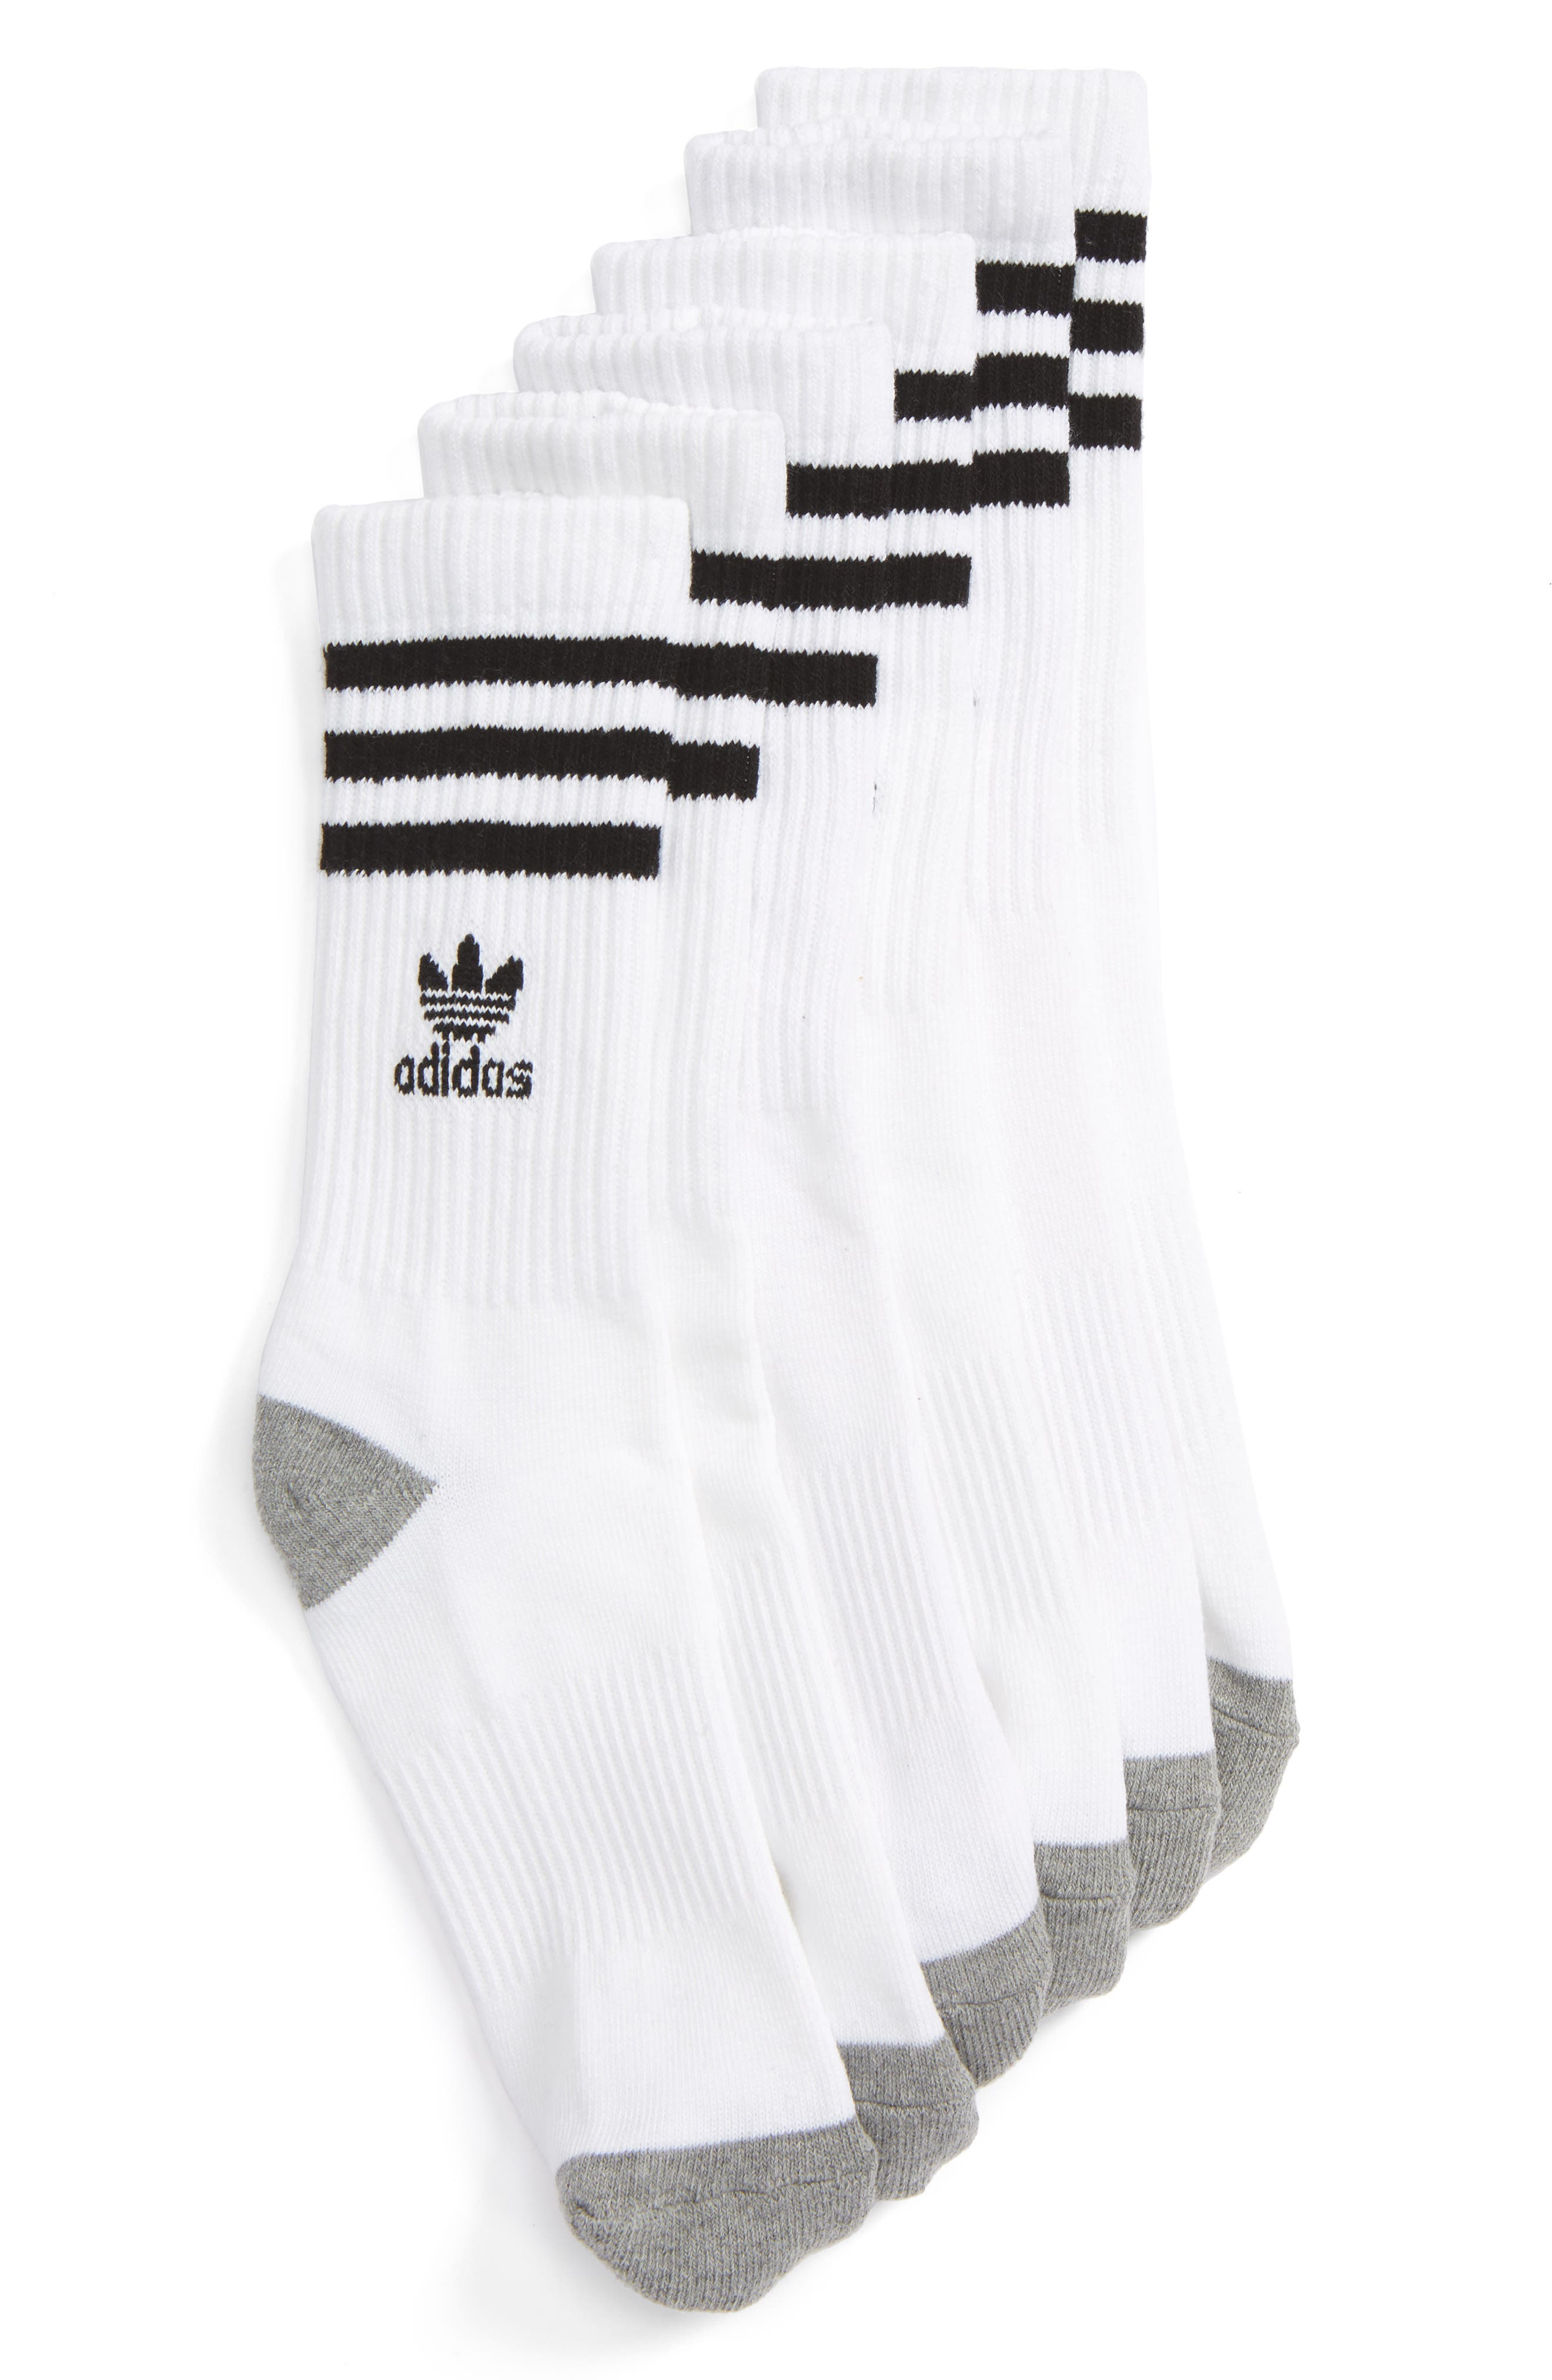 3-Pack Original Cushioned Crew Socks,                         Main,                         color, White/ Black/ White